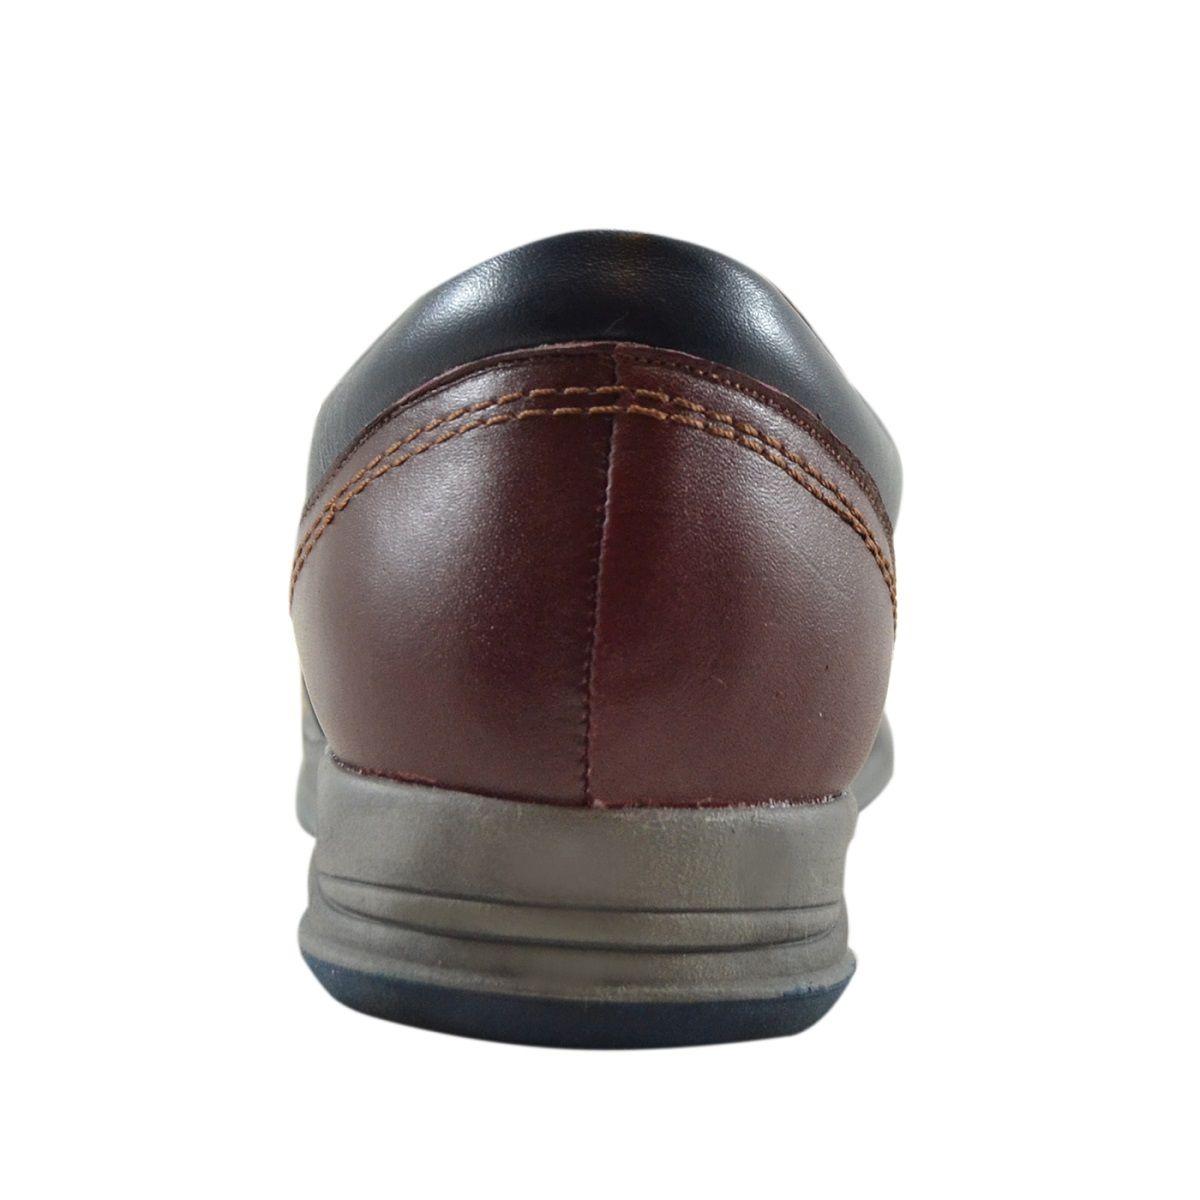 کفش روزمره زنانه کد 554 -  - 2